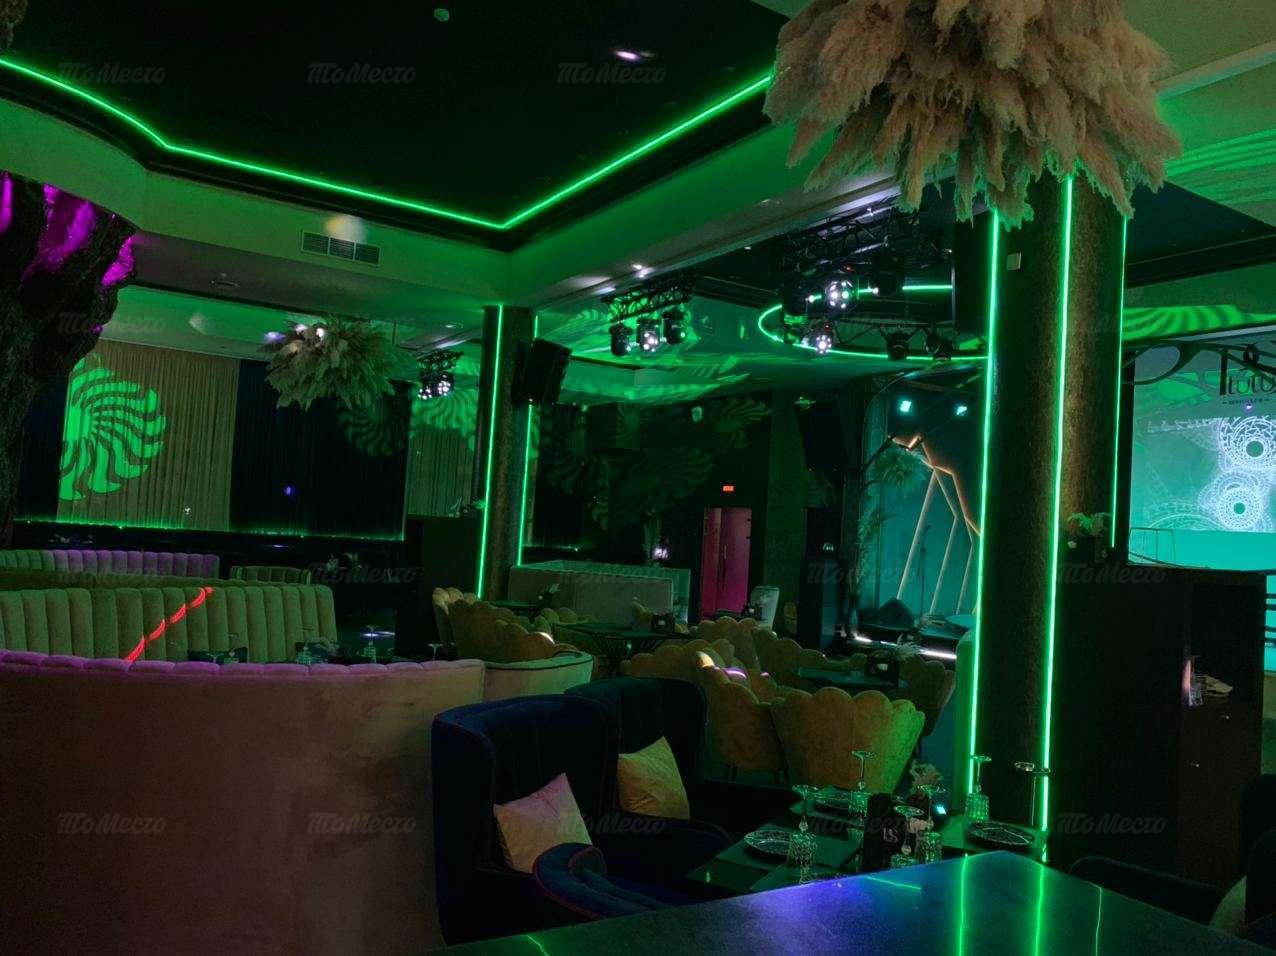 Ресторан Плутус (Plutus) на Несербской фото 10